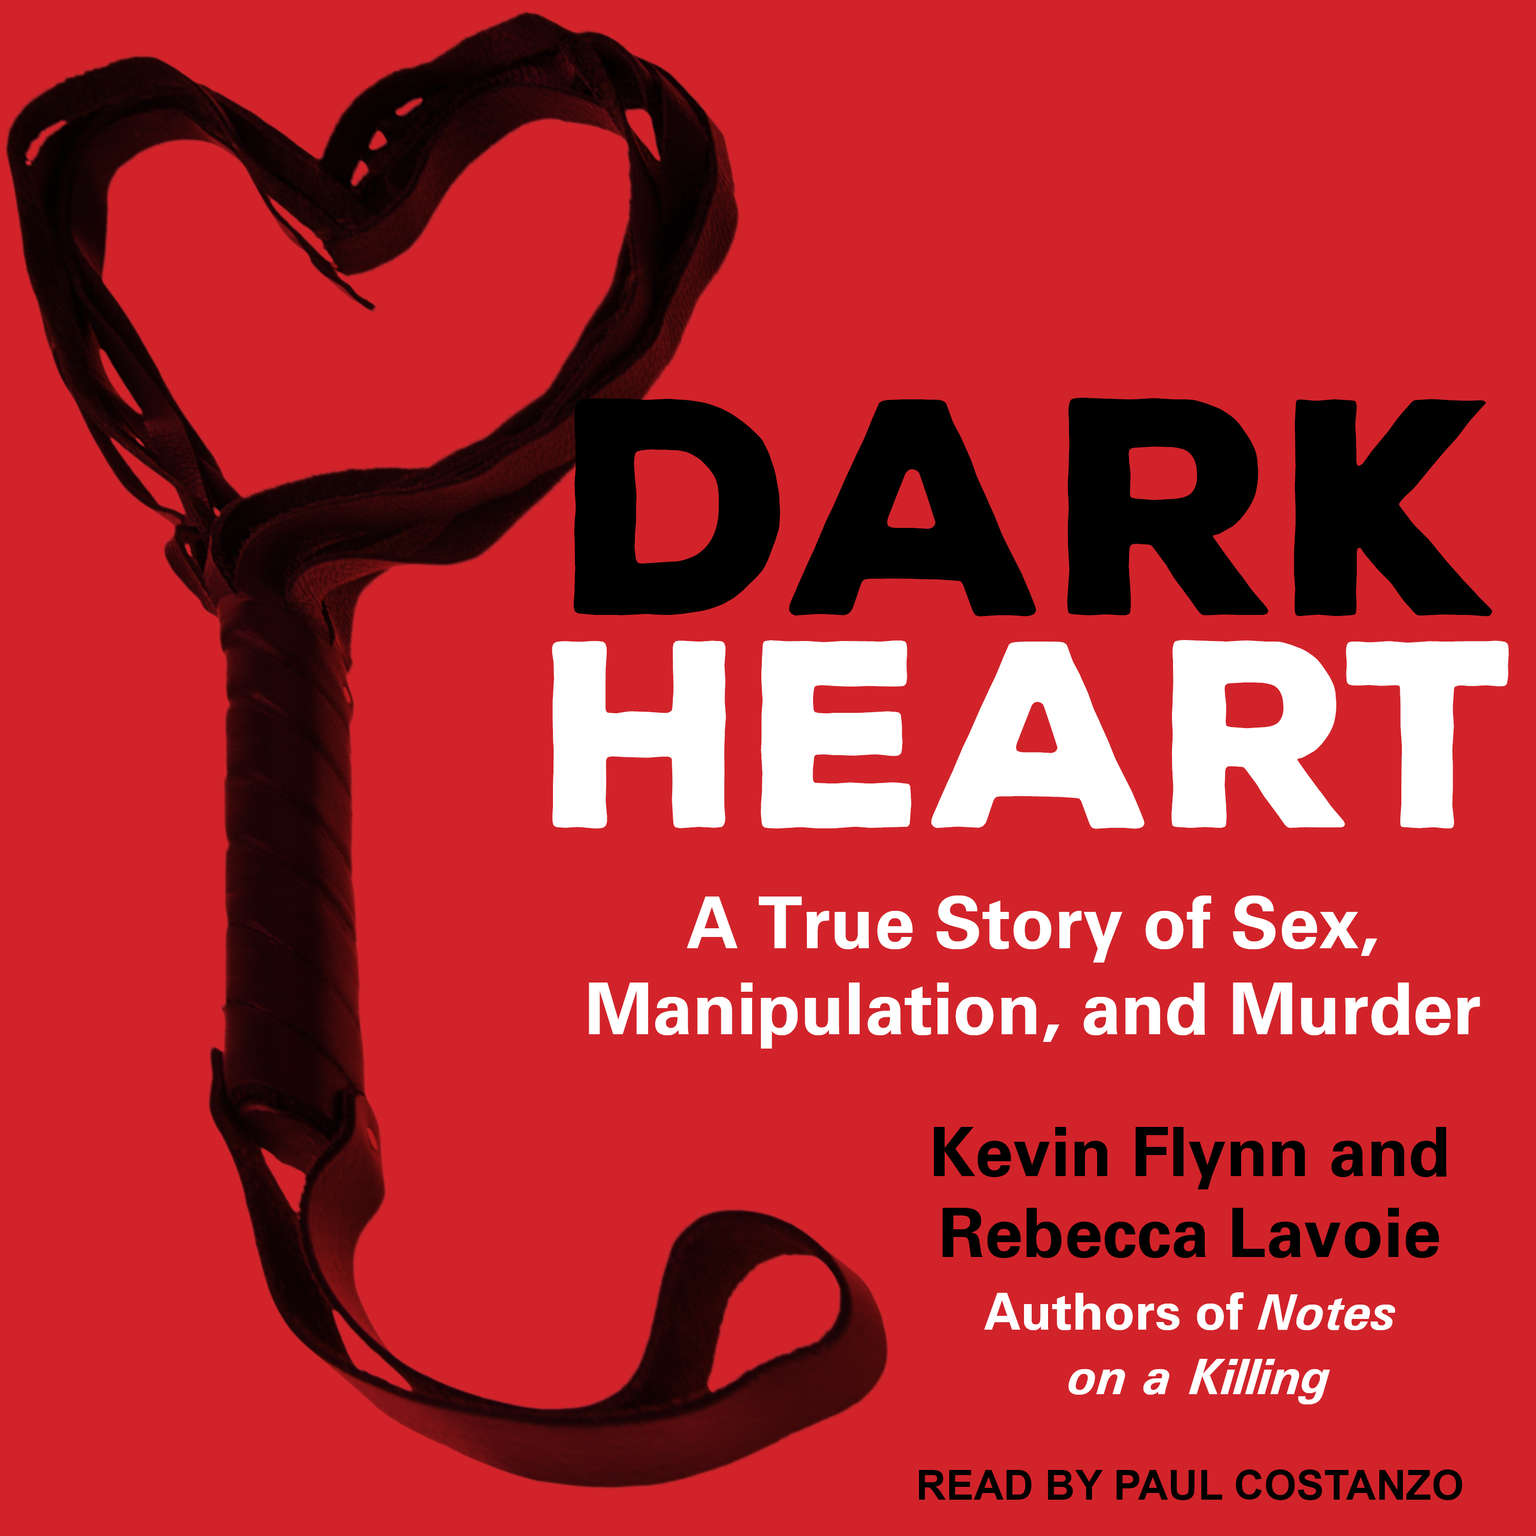 Dark Heart: A True Story of Sex, Manipulation, and Murder Audiobook, by Kevin Flynn